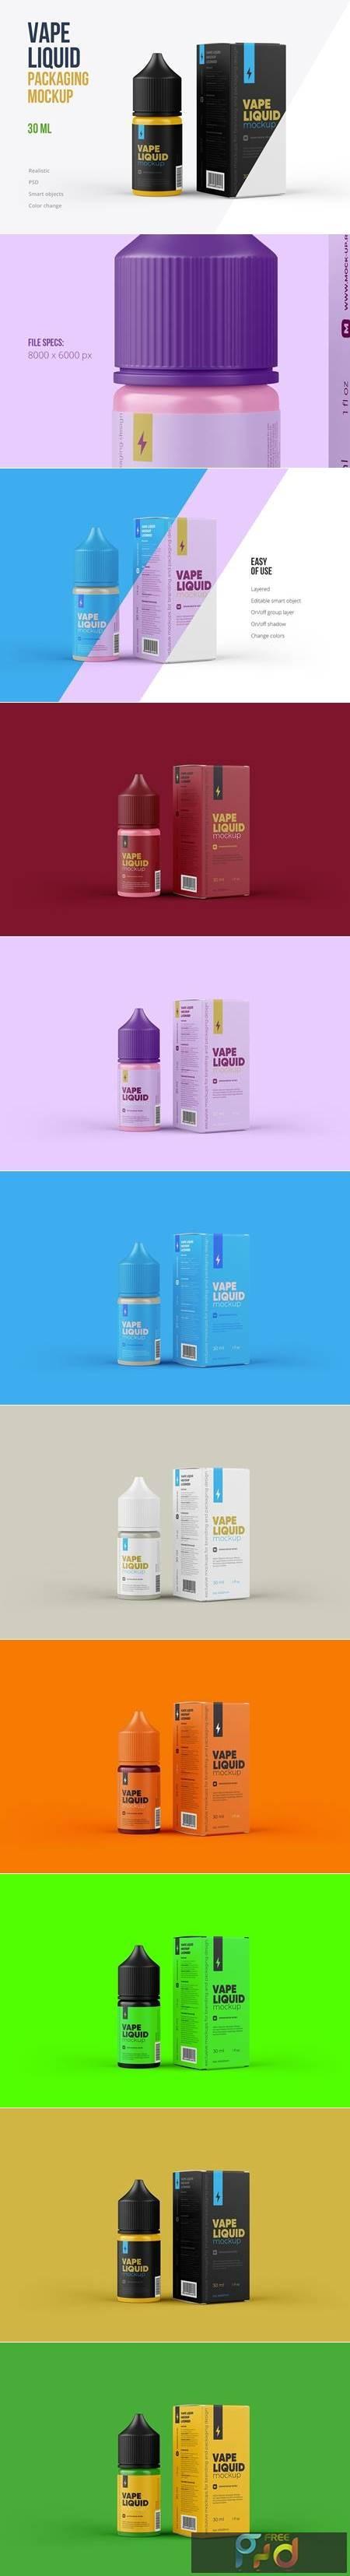 Vape Liquid Packaging Mockup 30ml 5731607 1